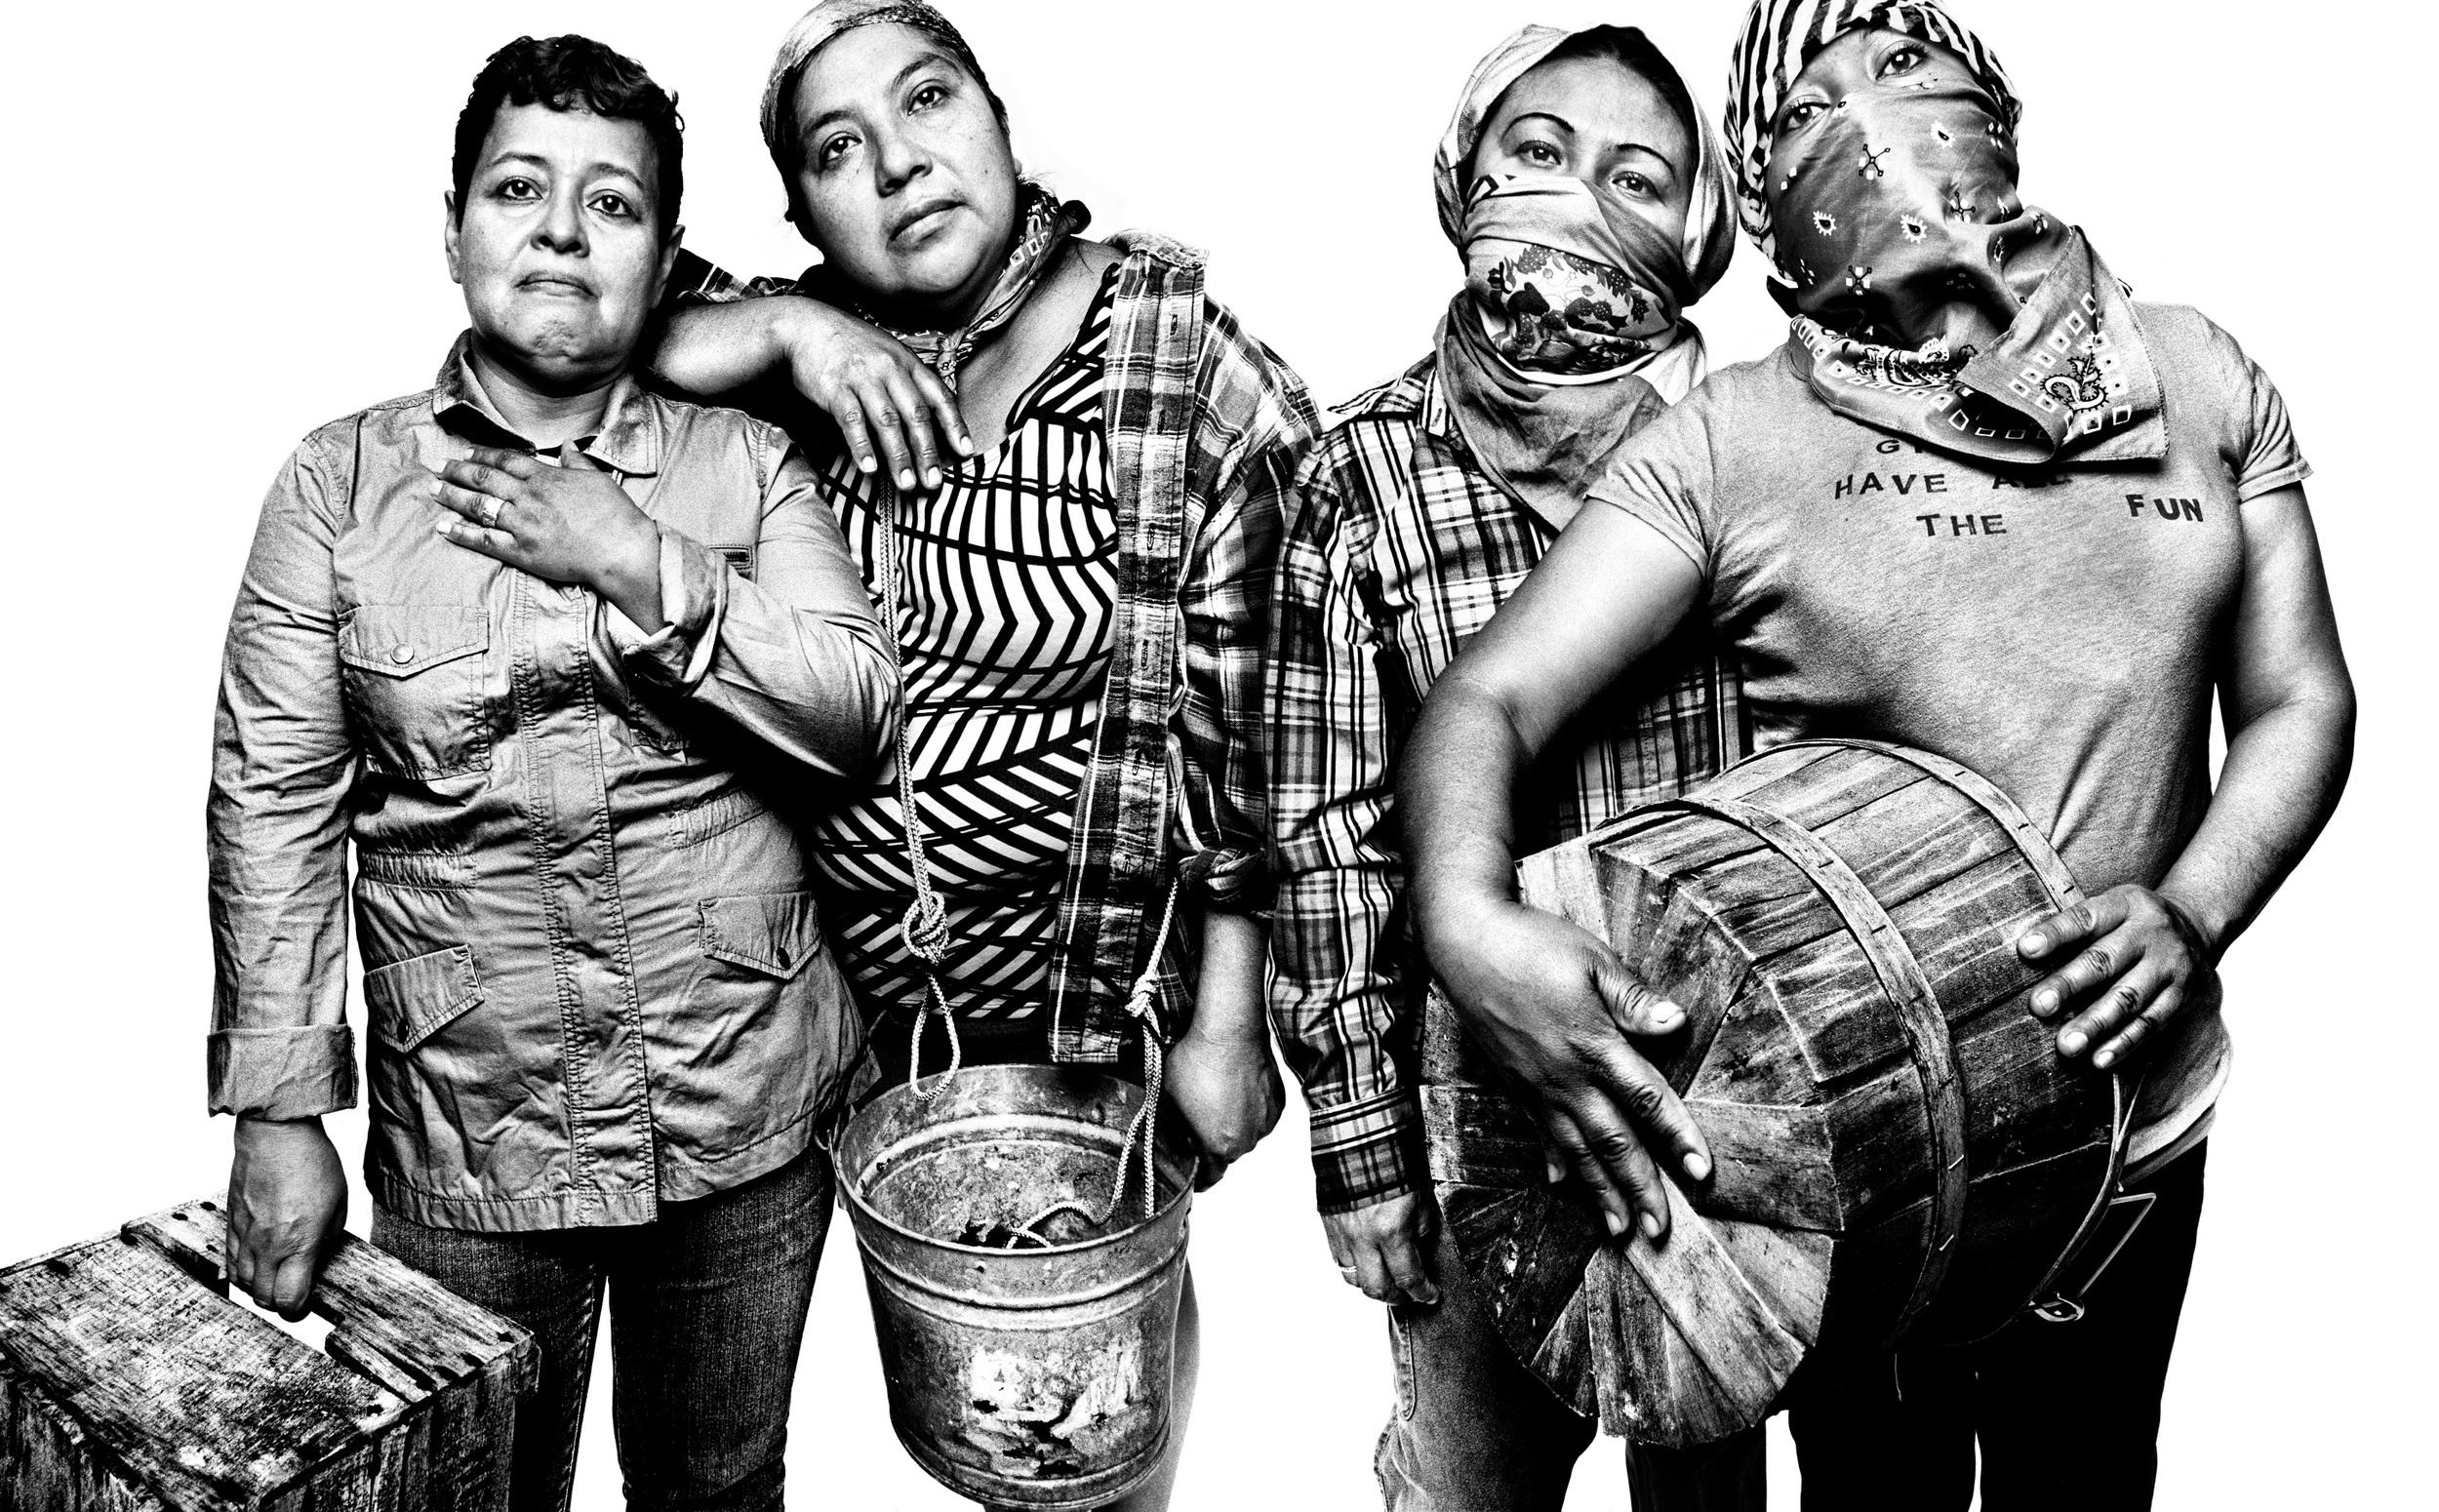 Alina Diaz, 53; Lidia Franco, 33; Gisela Castillo, 35; Marilu Nava-Cervantes, 46 | Washington, D.C. | July 15, 2013